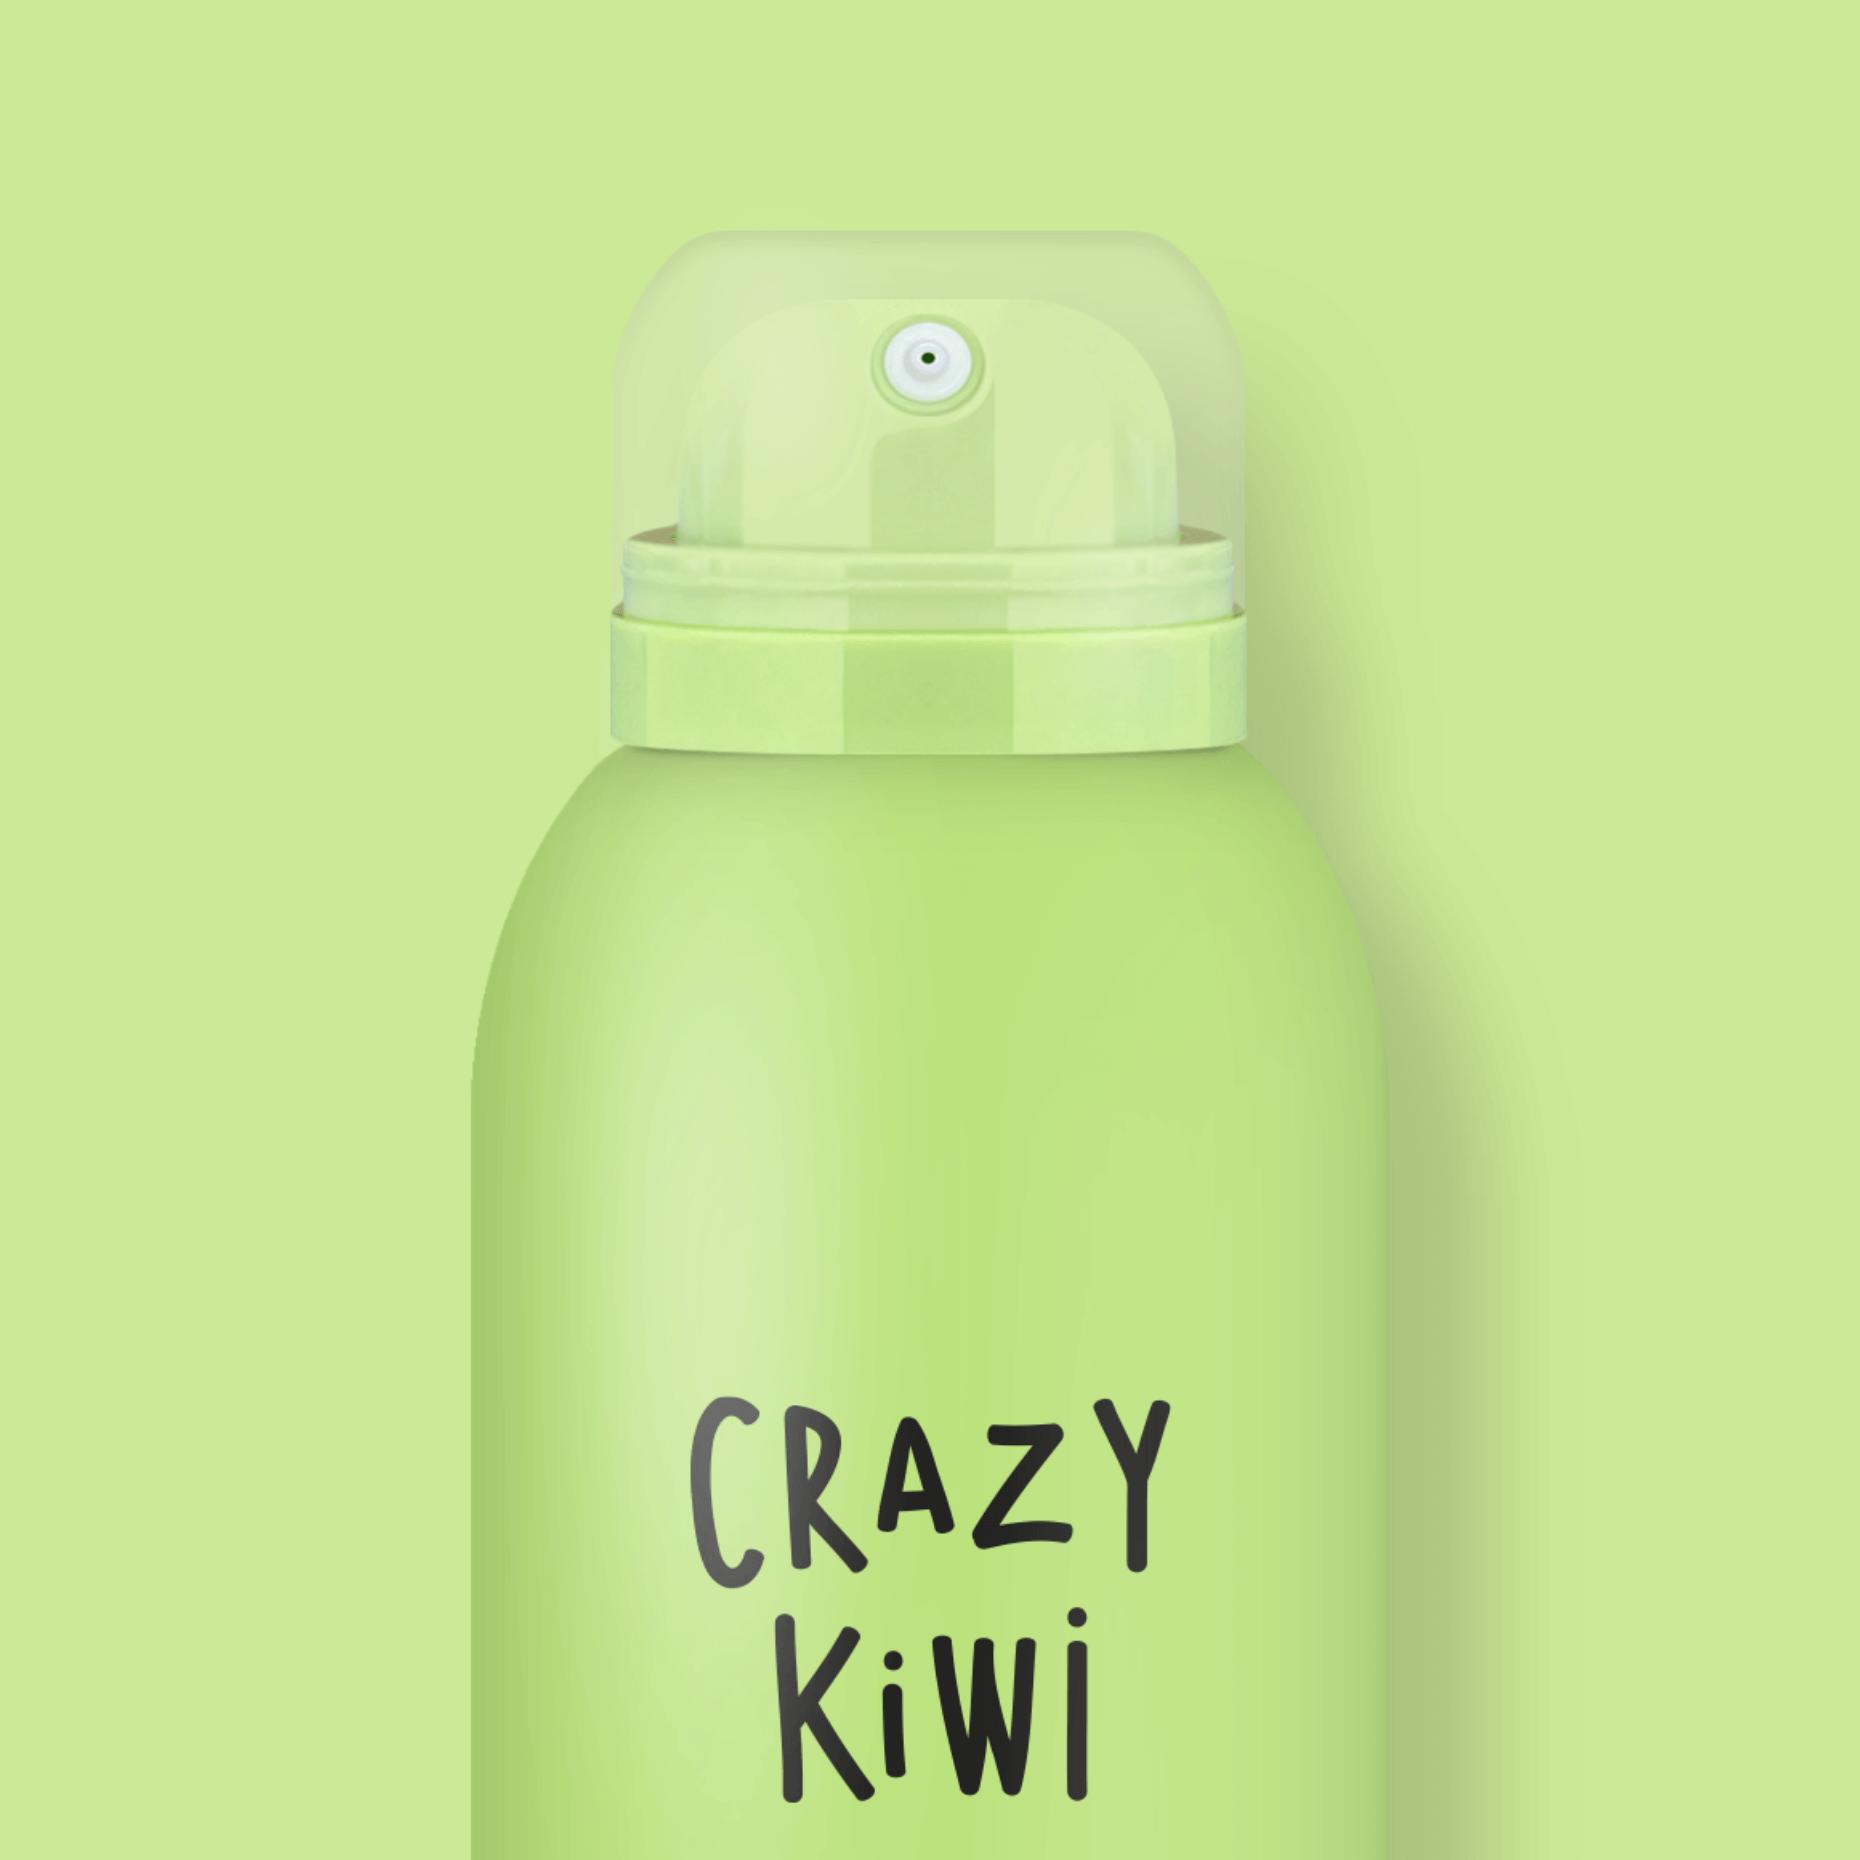 Crazy Kiwi